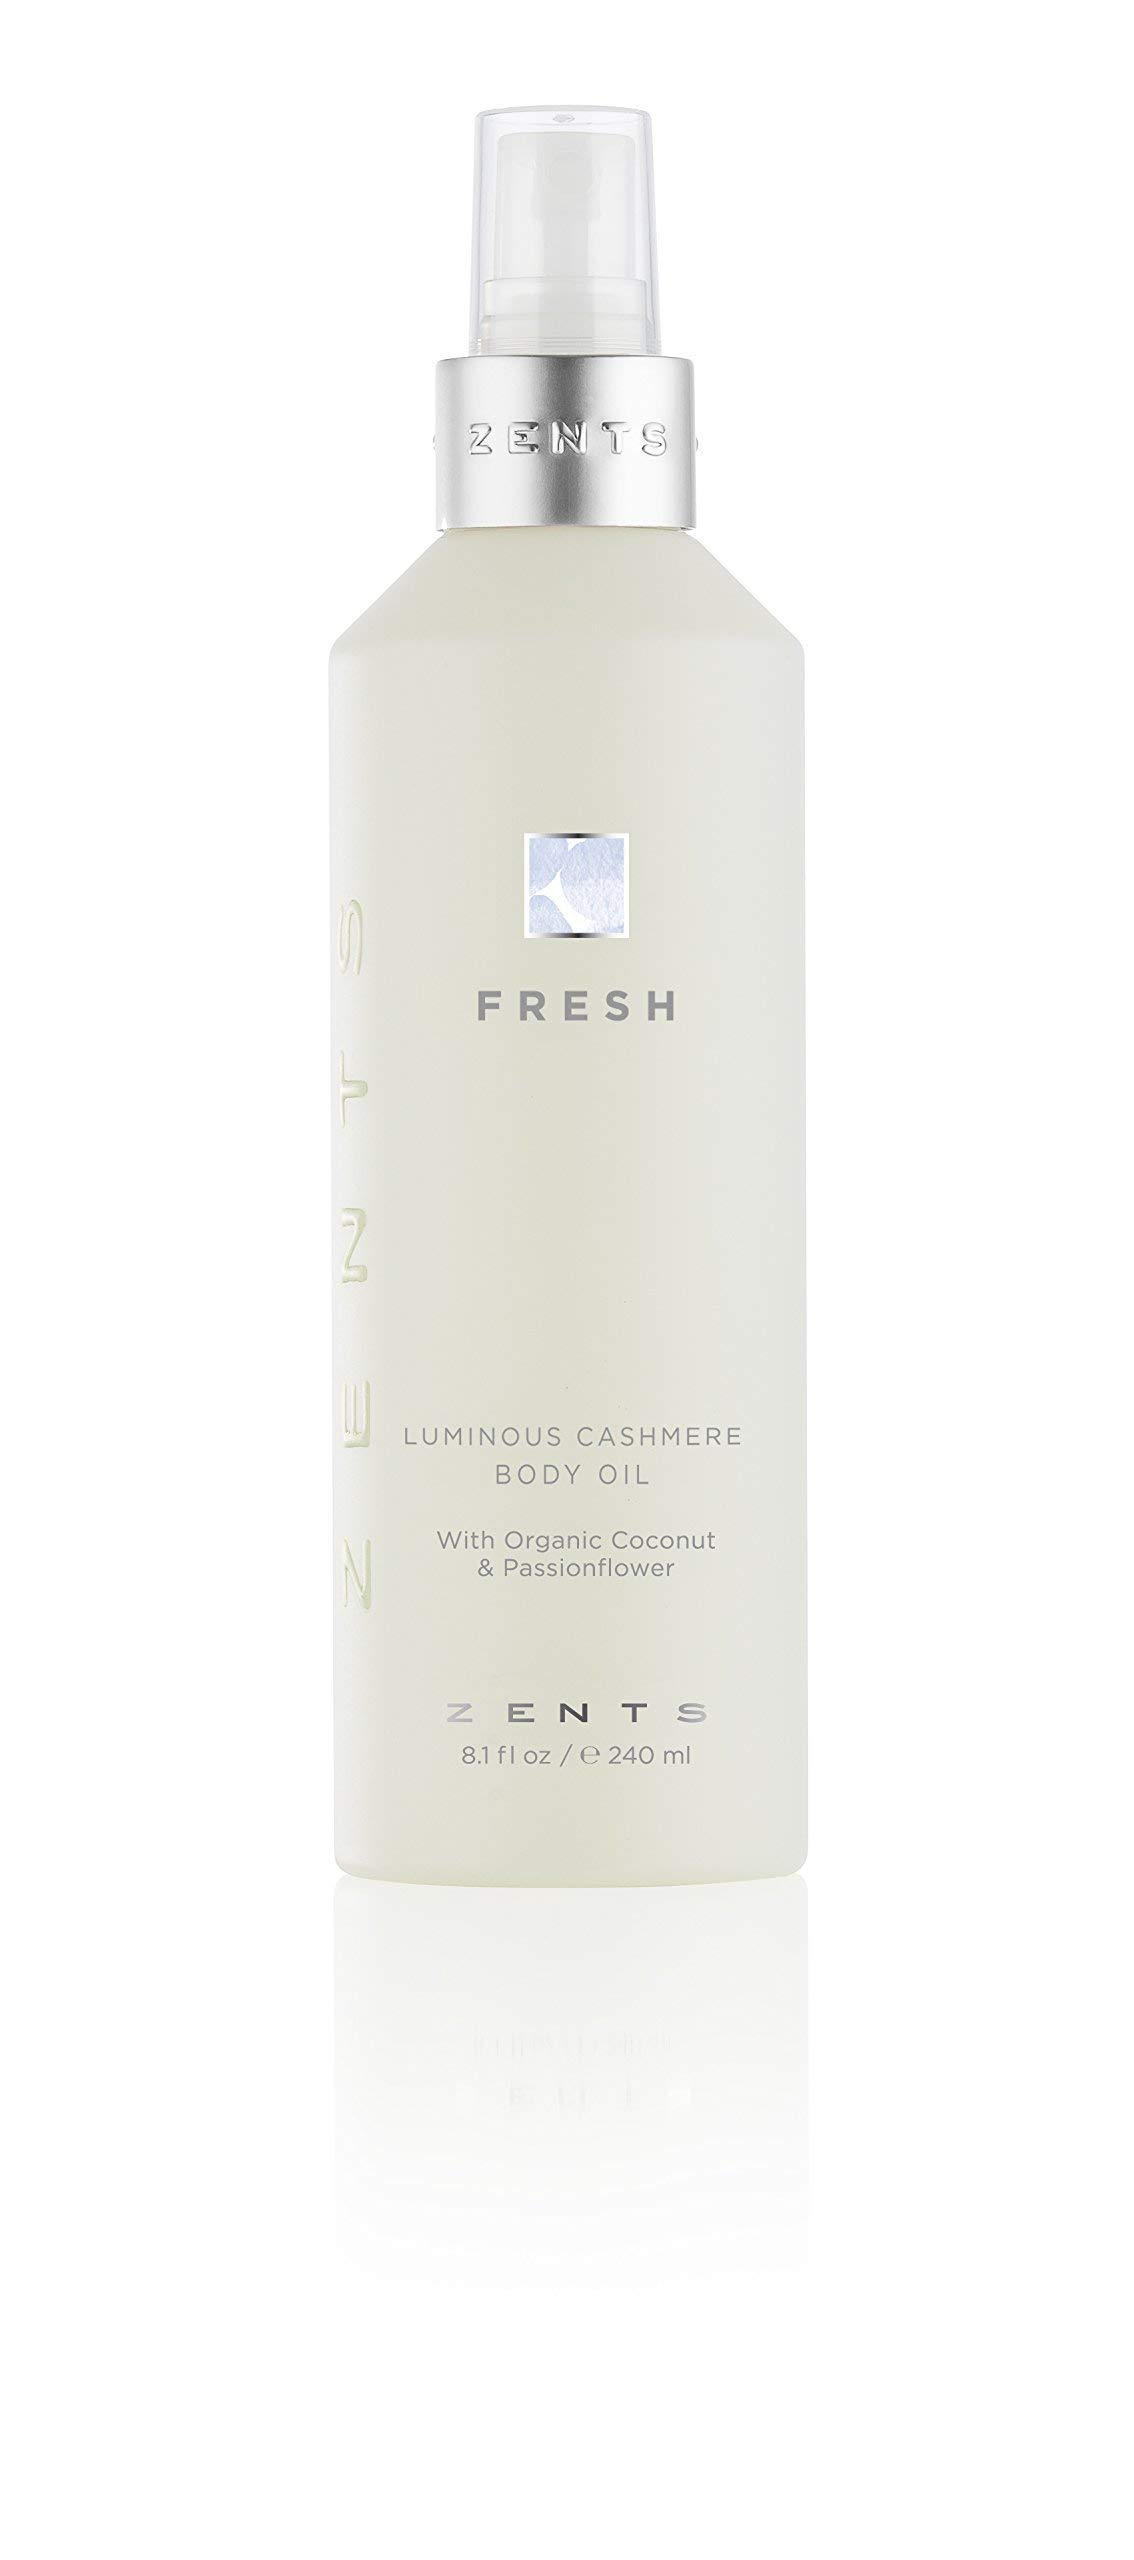 Zents Luminous Cashmere Body Oil, Soften and Moisturize Skin with Vitamin E and Organic Coconut Oil, 8 fl oz / 240 ml(Fresh)